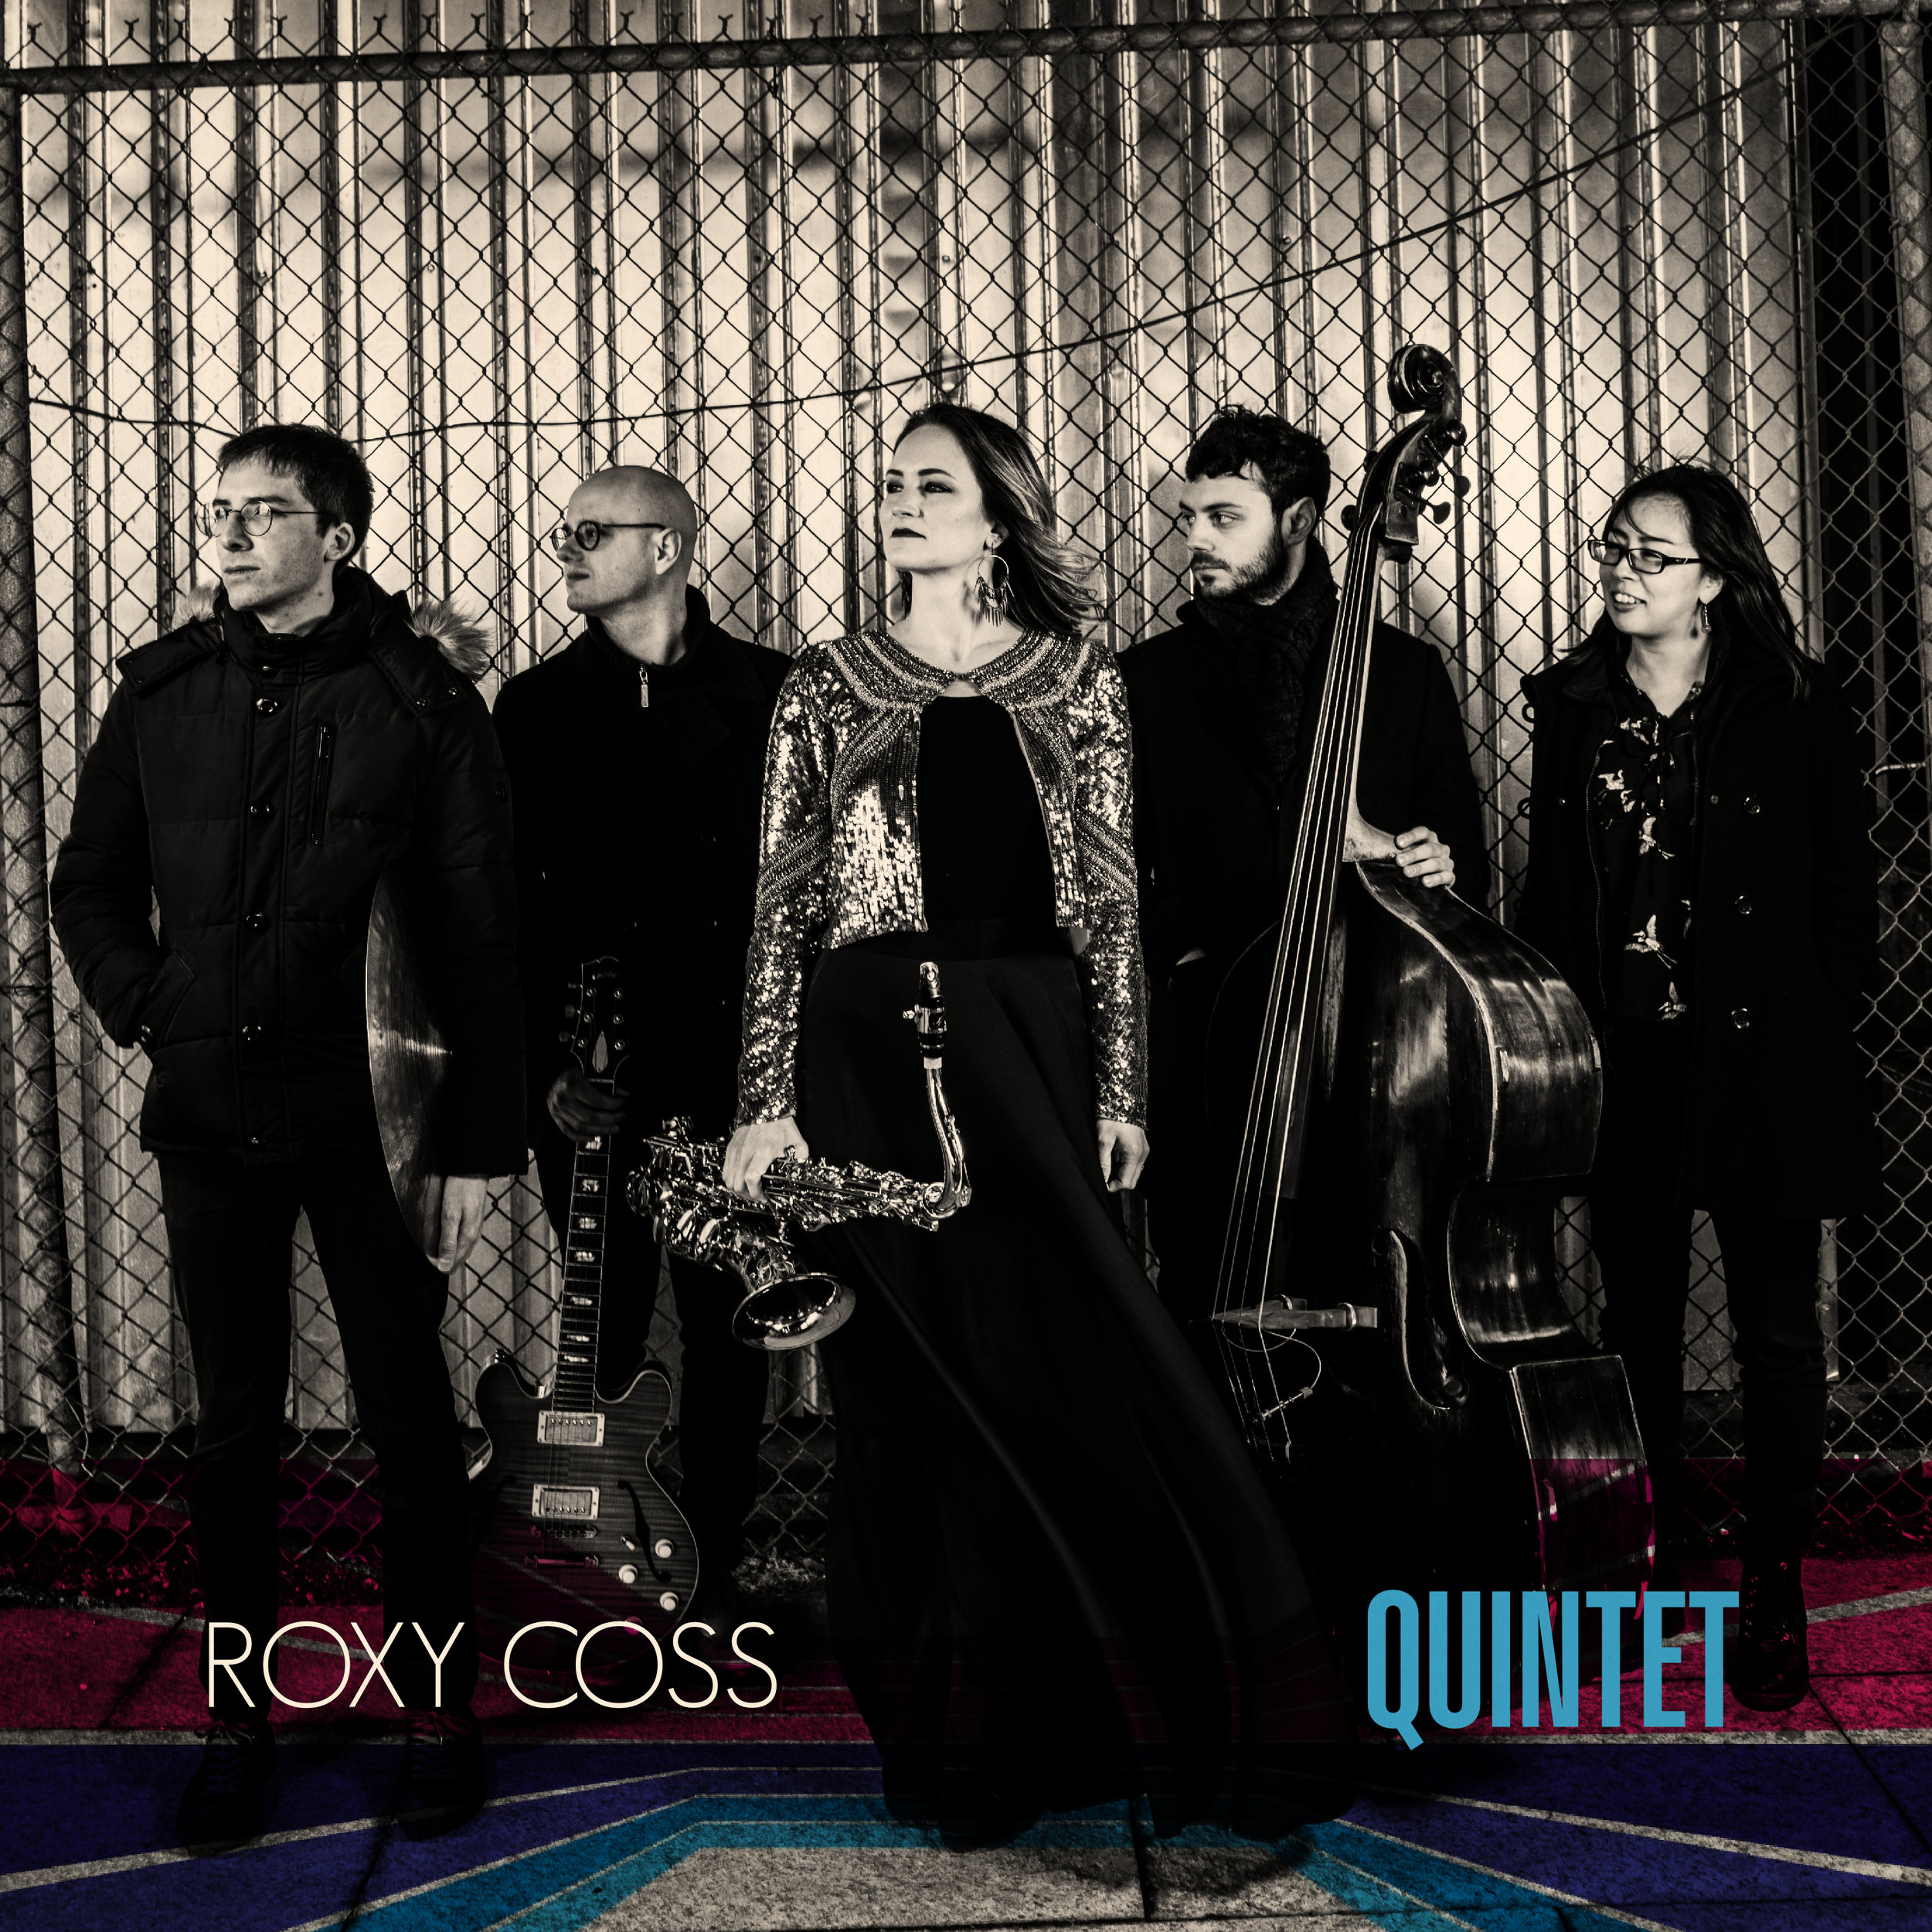 Copy of Roxy Coss Quintet Cover.jpg